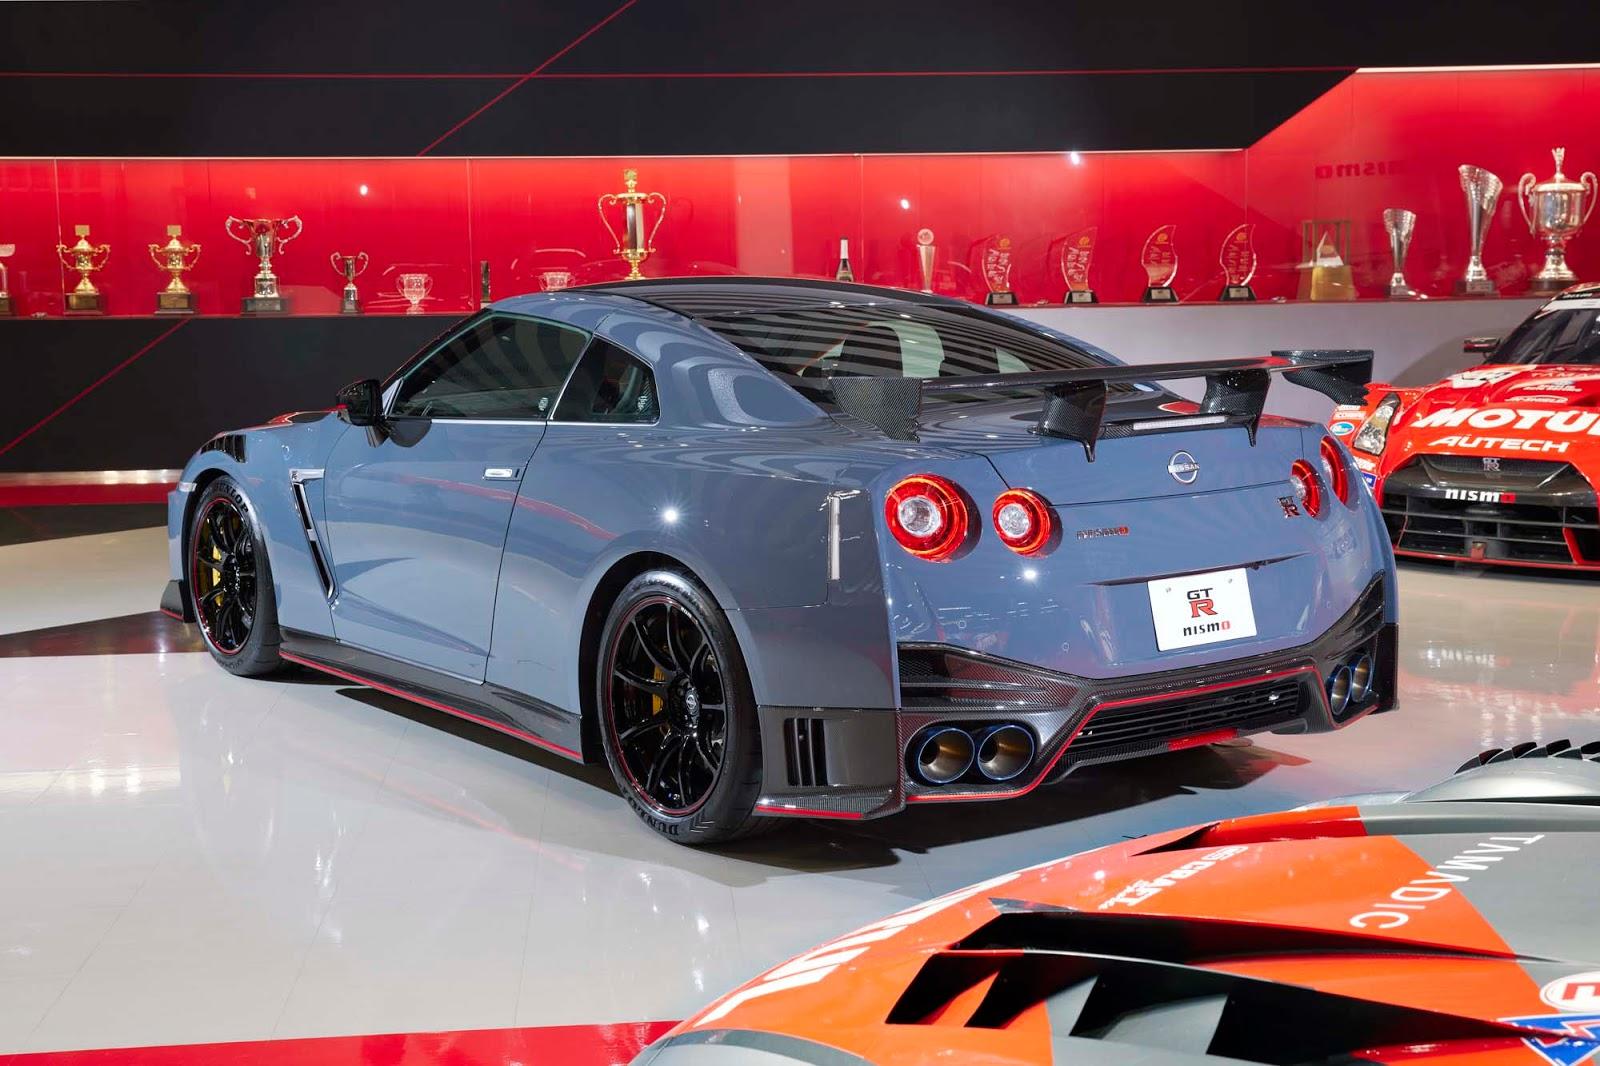 210408 New GT R NISMO 2813 1